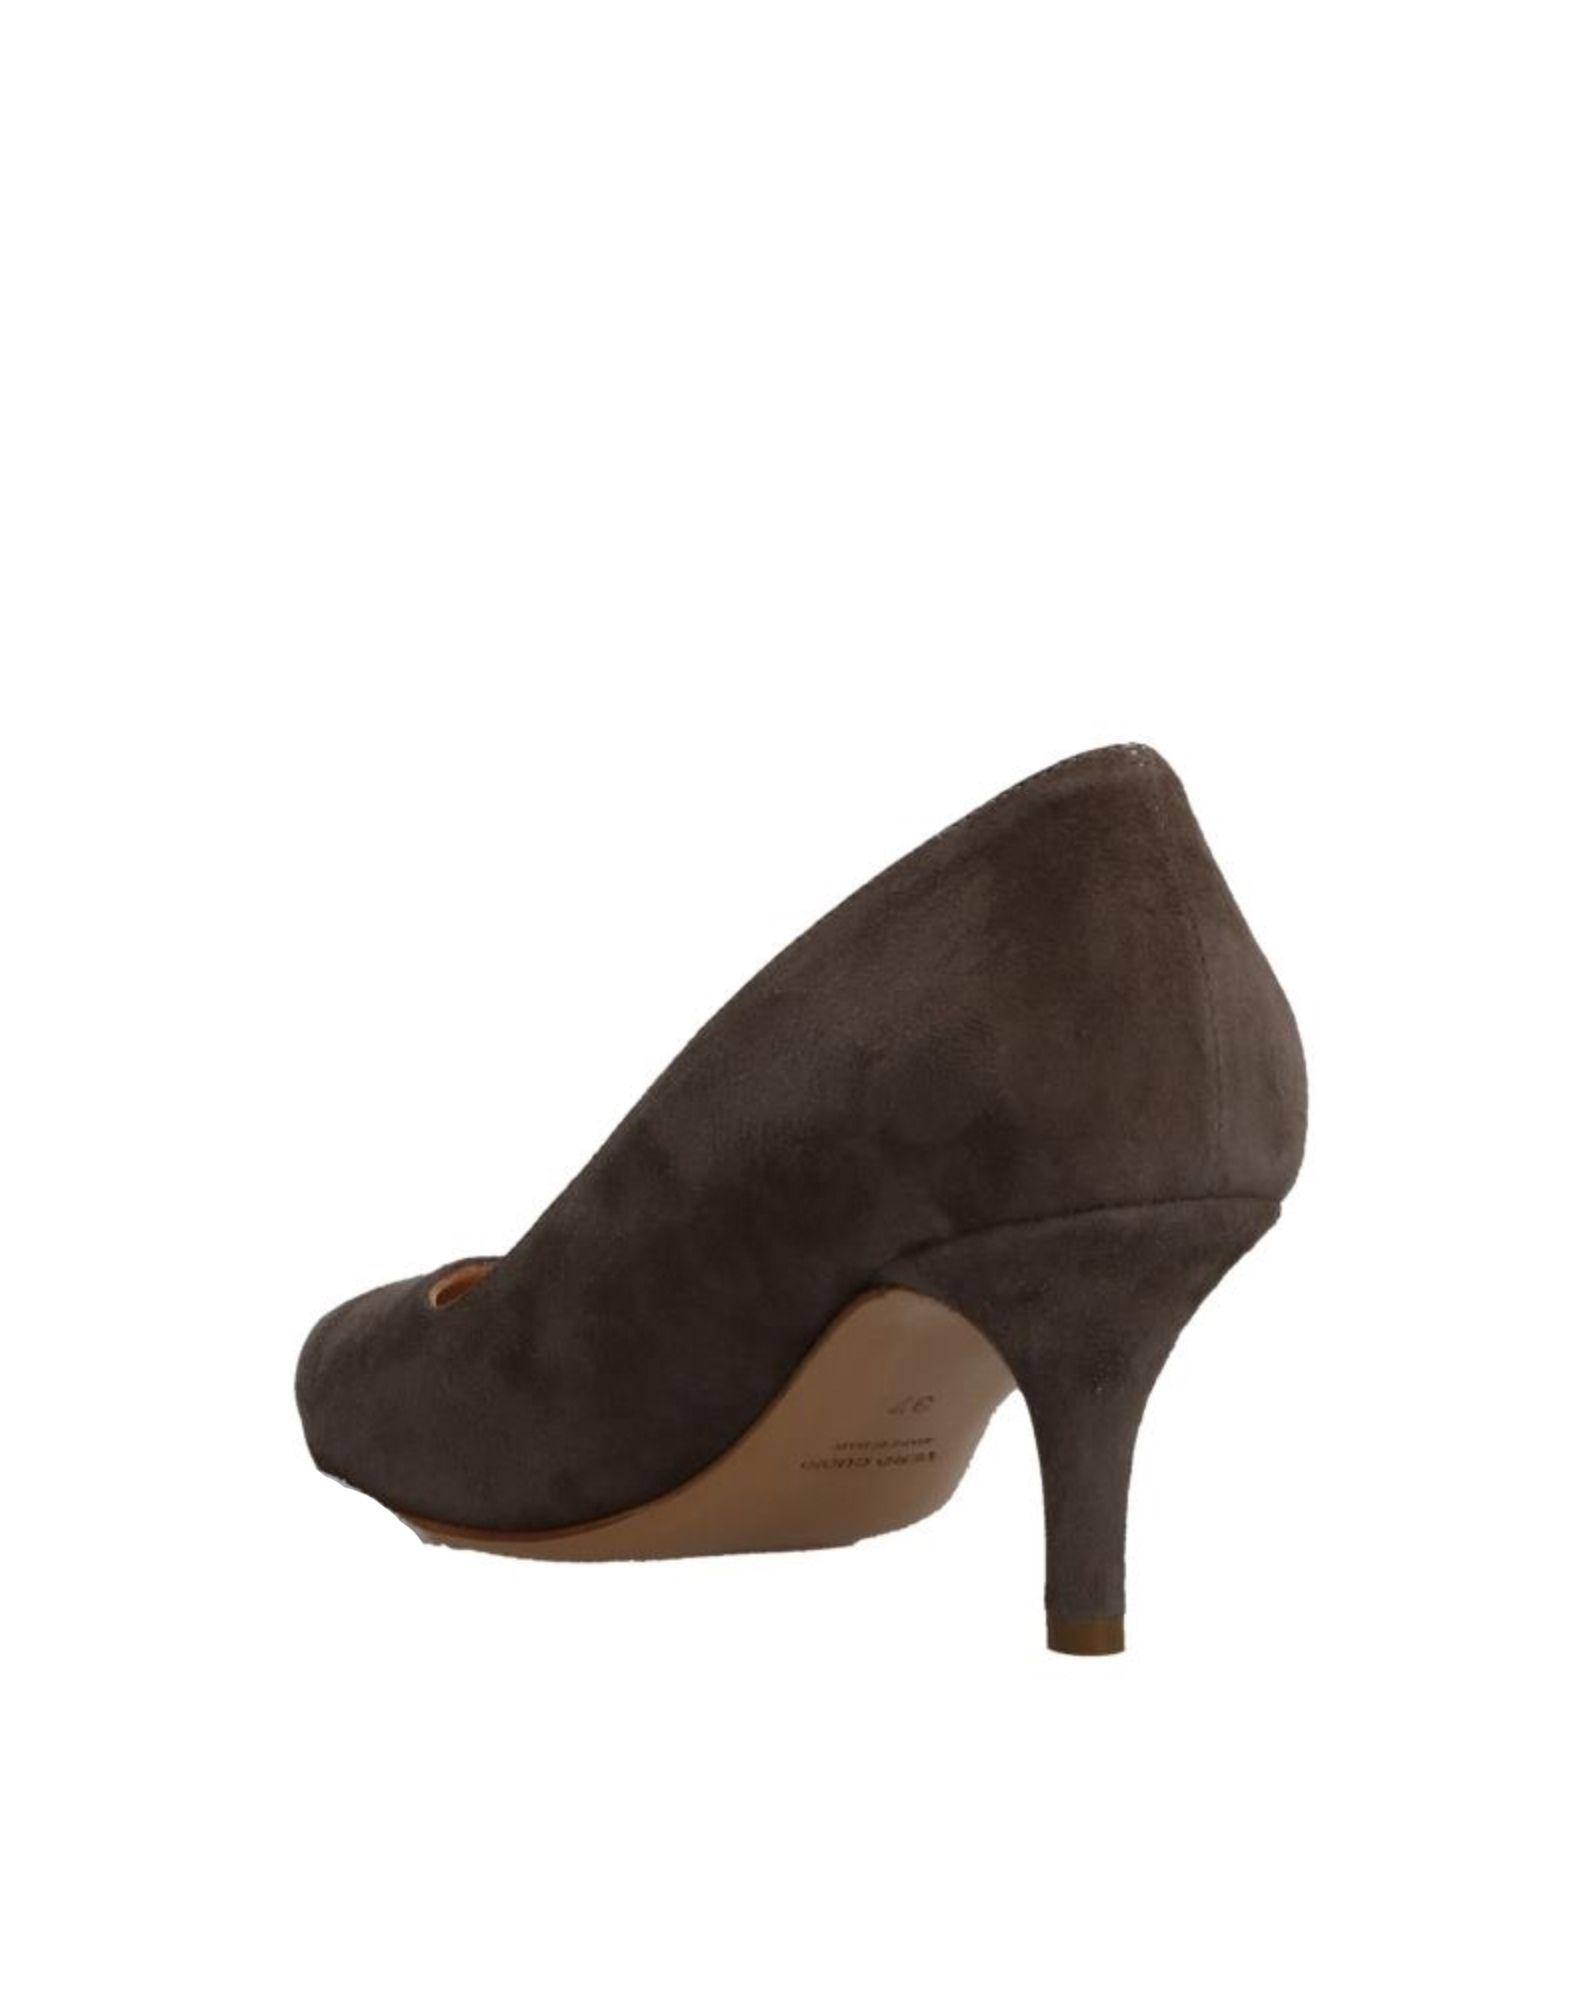 Vincenzo Piccolo Pumps Damen  Schuhe 11525387MK Gute Qualität beliebte Schuhe  b83d3e